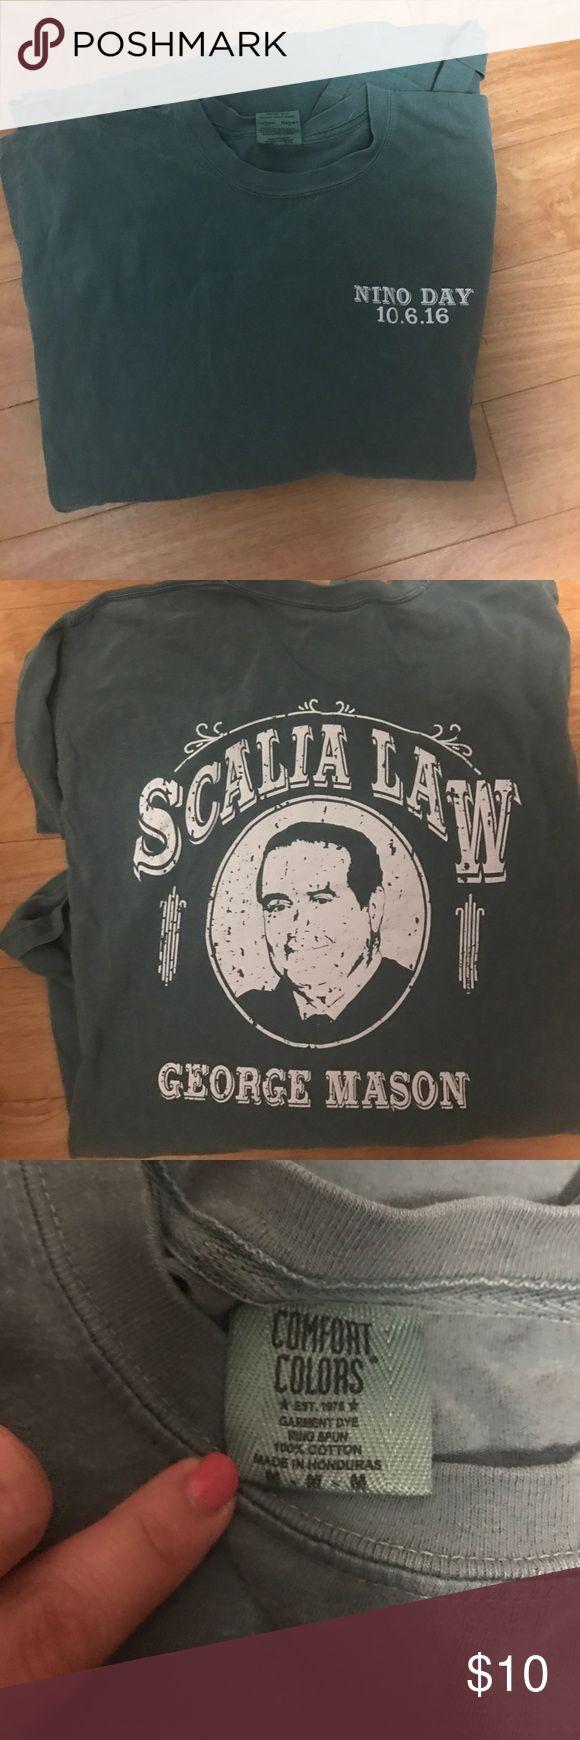 Color printing gmu - George Mason Law School Shirt Scalia Law School Nino Day T Shirt Size Medium Shirts Tees